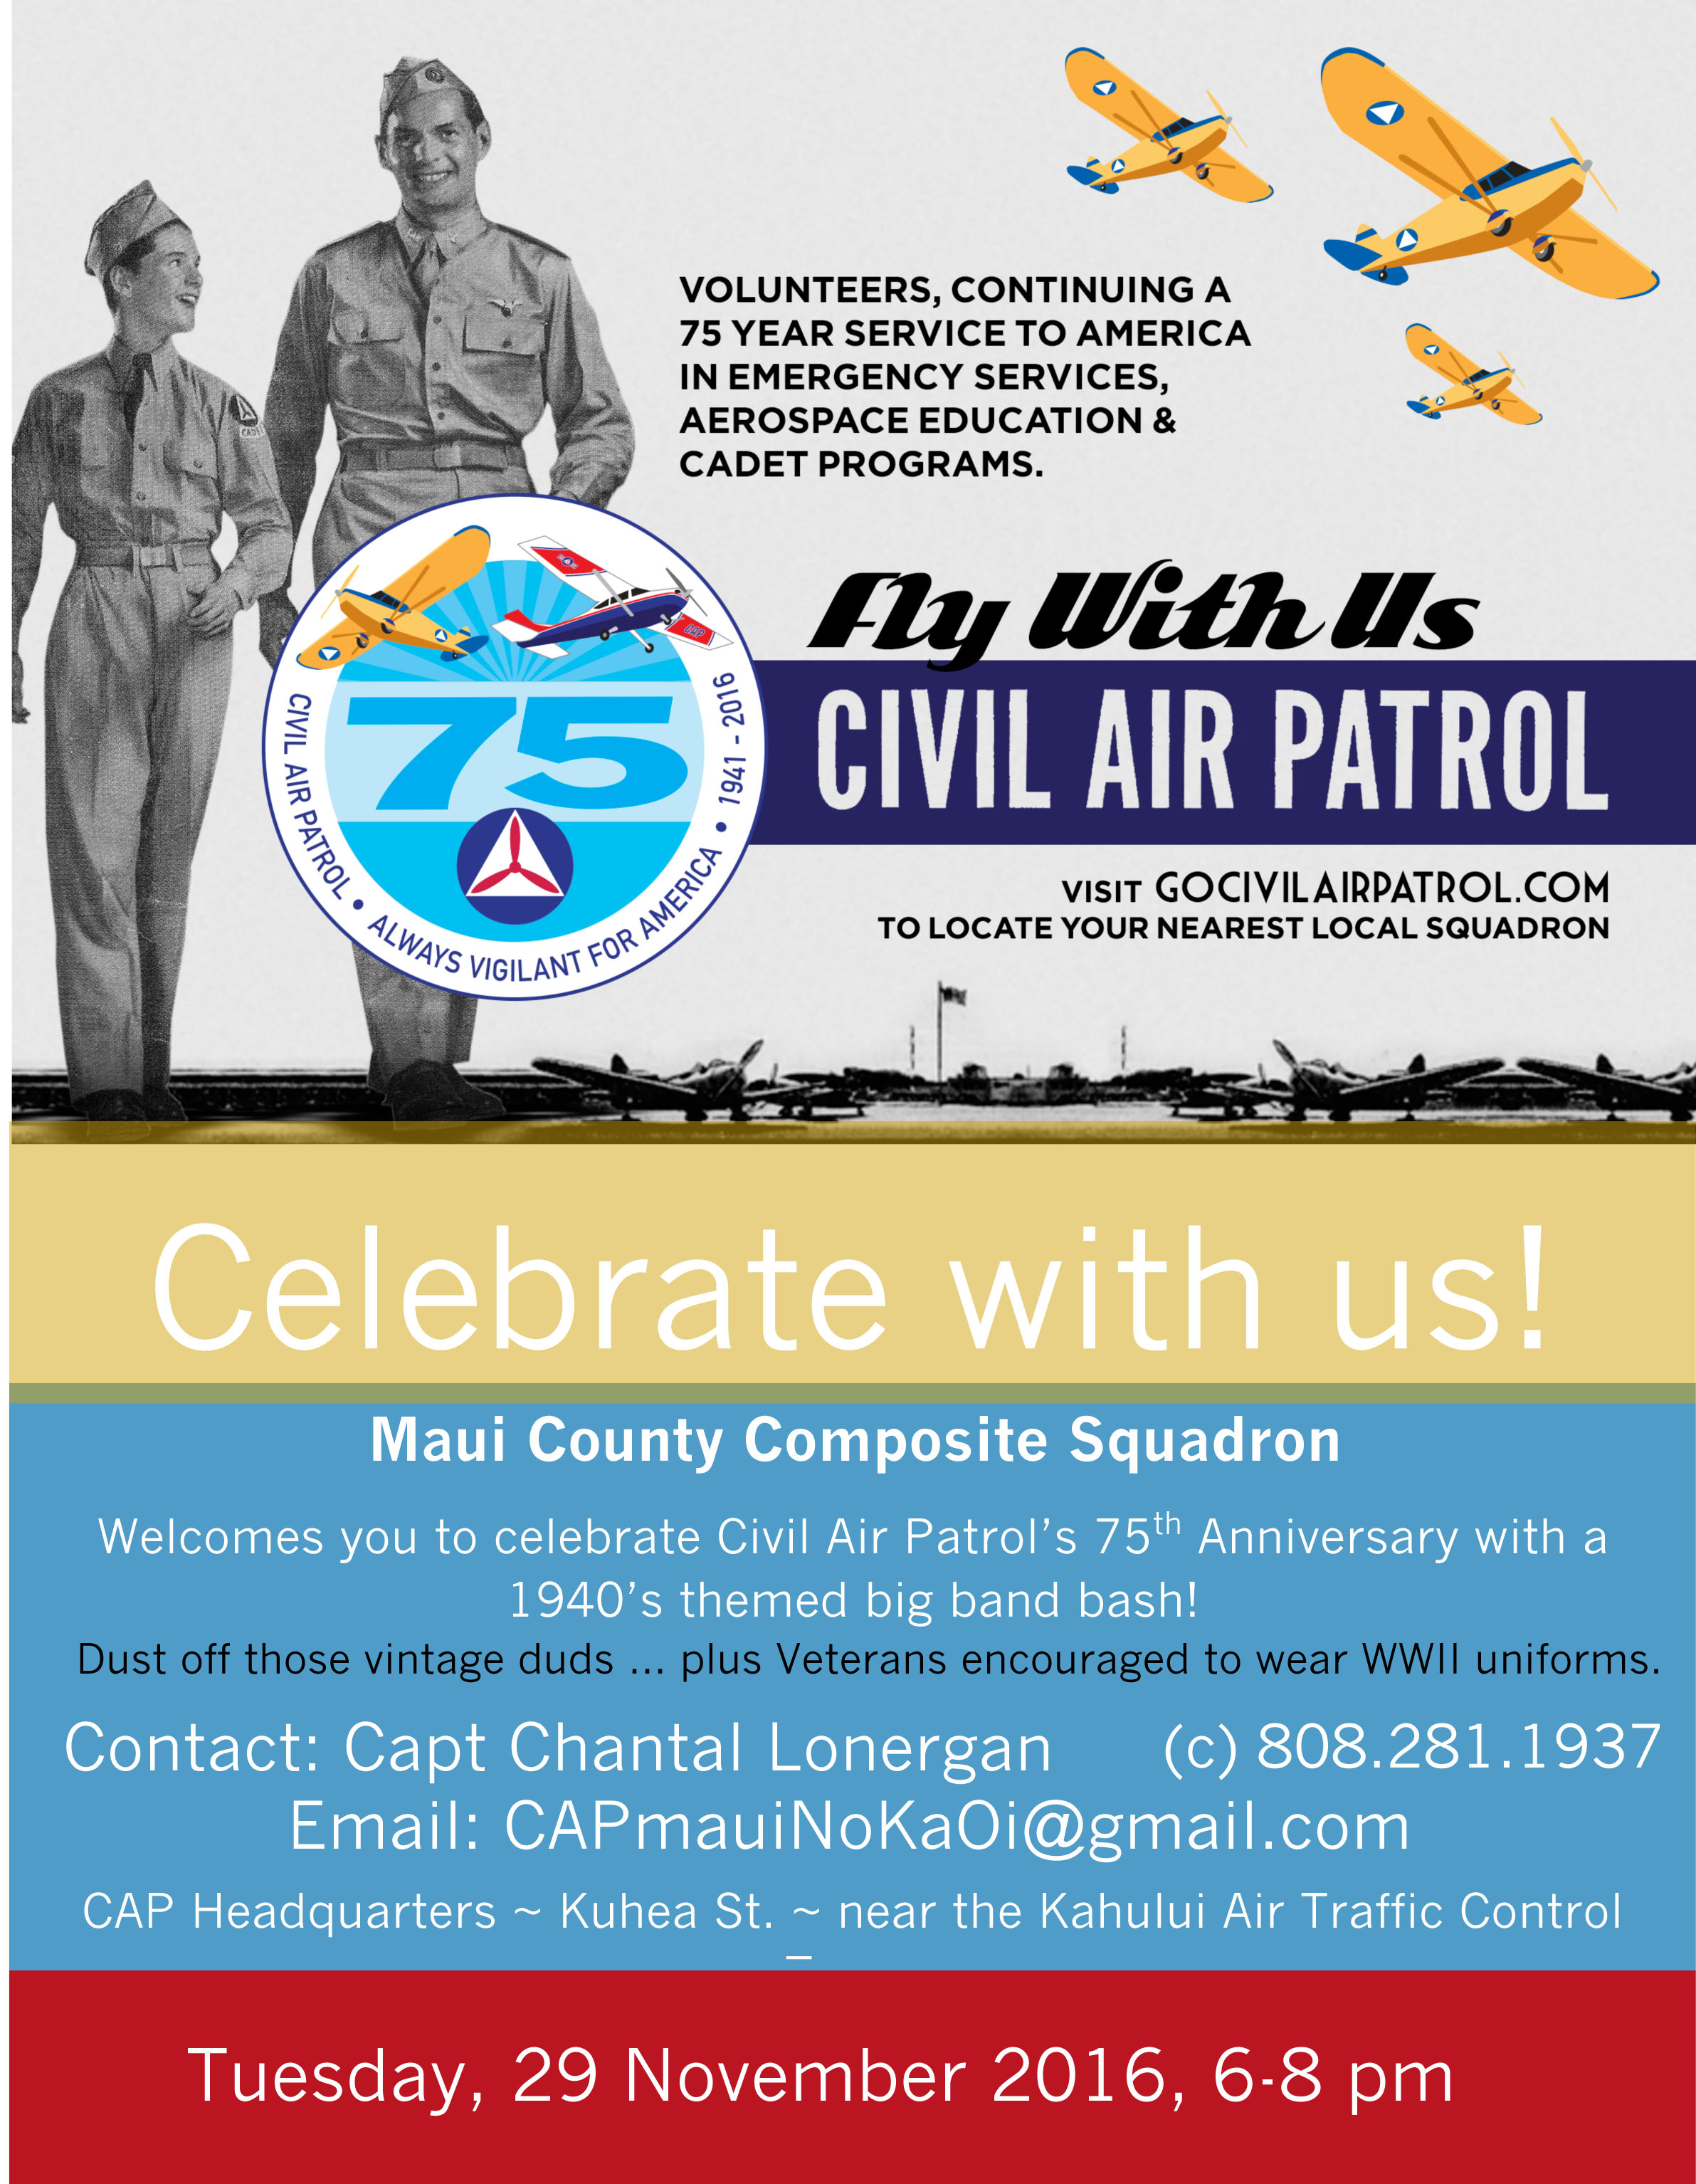 Maui Civil Air Patrol 75th Anniversary Big Band Bash and Open House